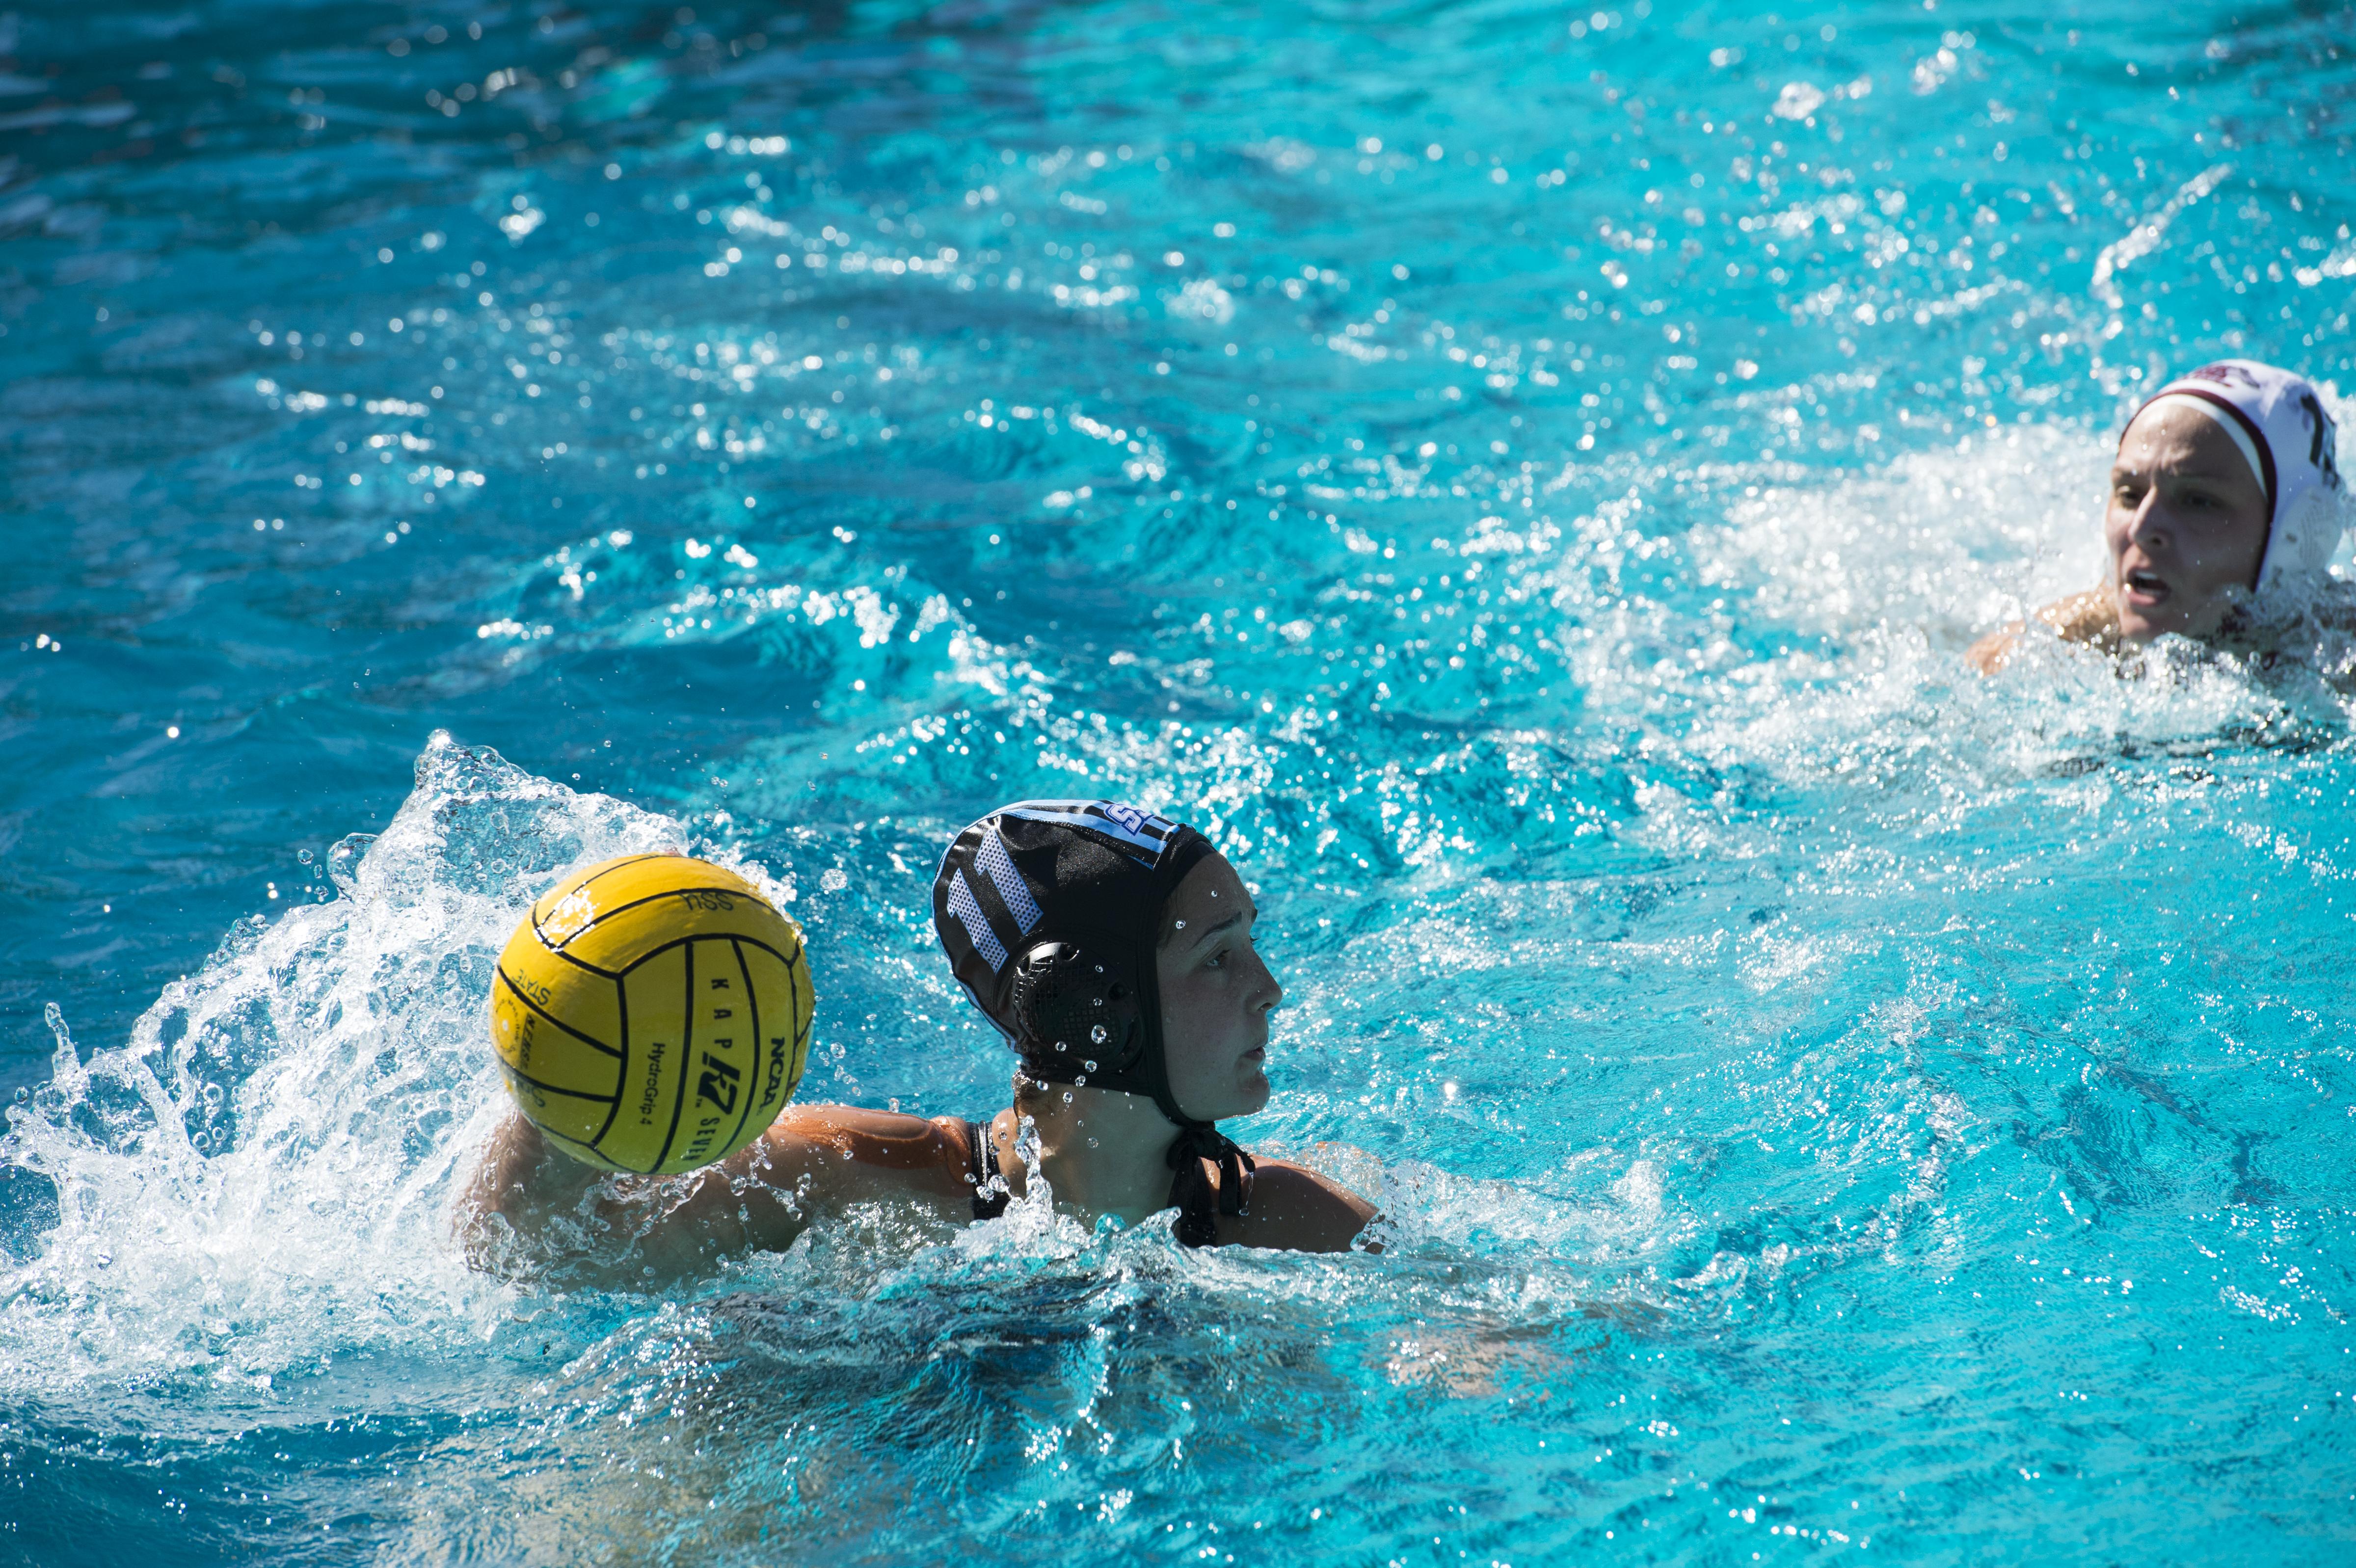 Women's water polo